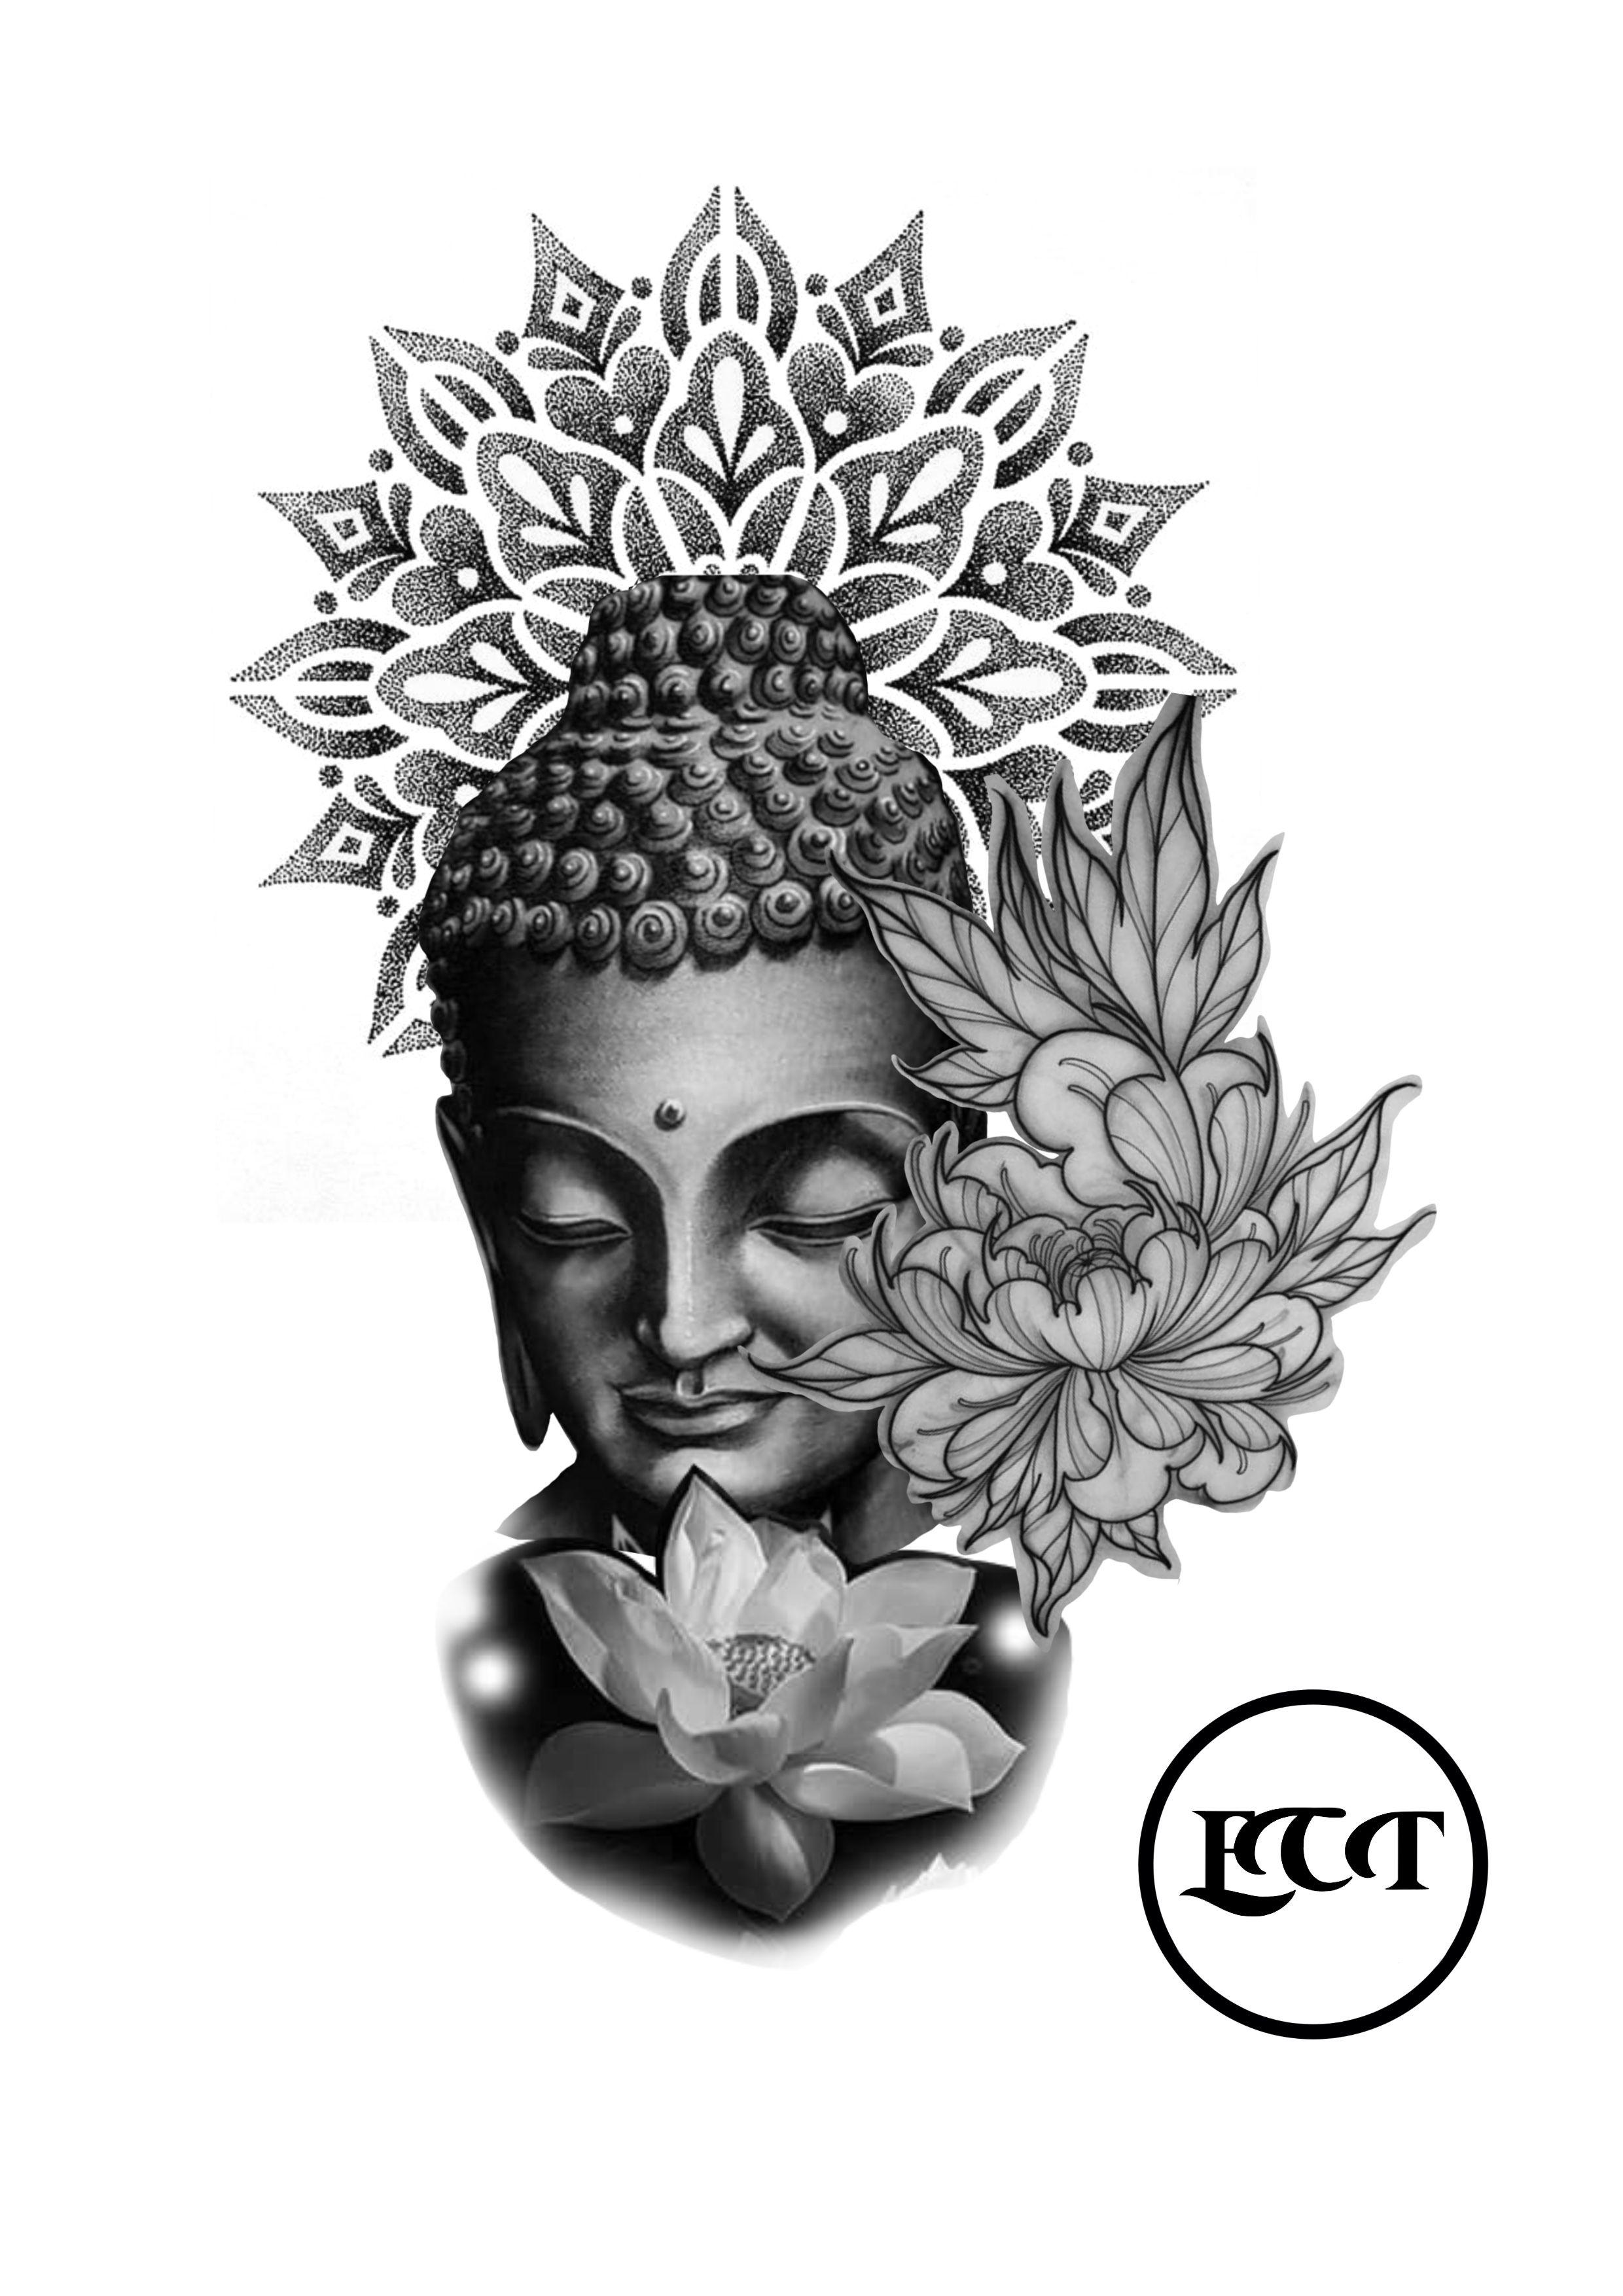 Pin By Taylor Sengpraseut On Tattoos And Piercings In 2020 Buddhist Tattoo Buddha Tattoo Design Buddha Tattoo Sleeve